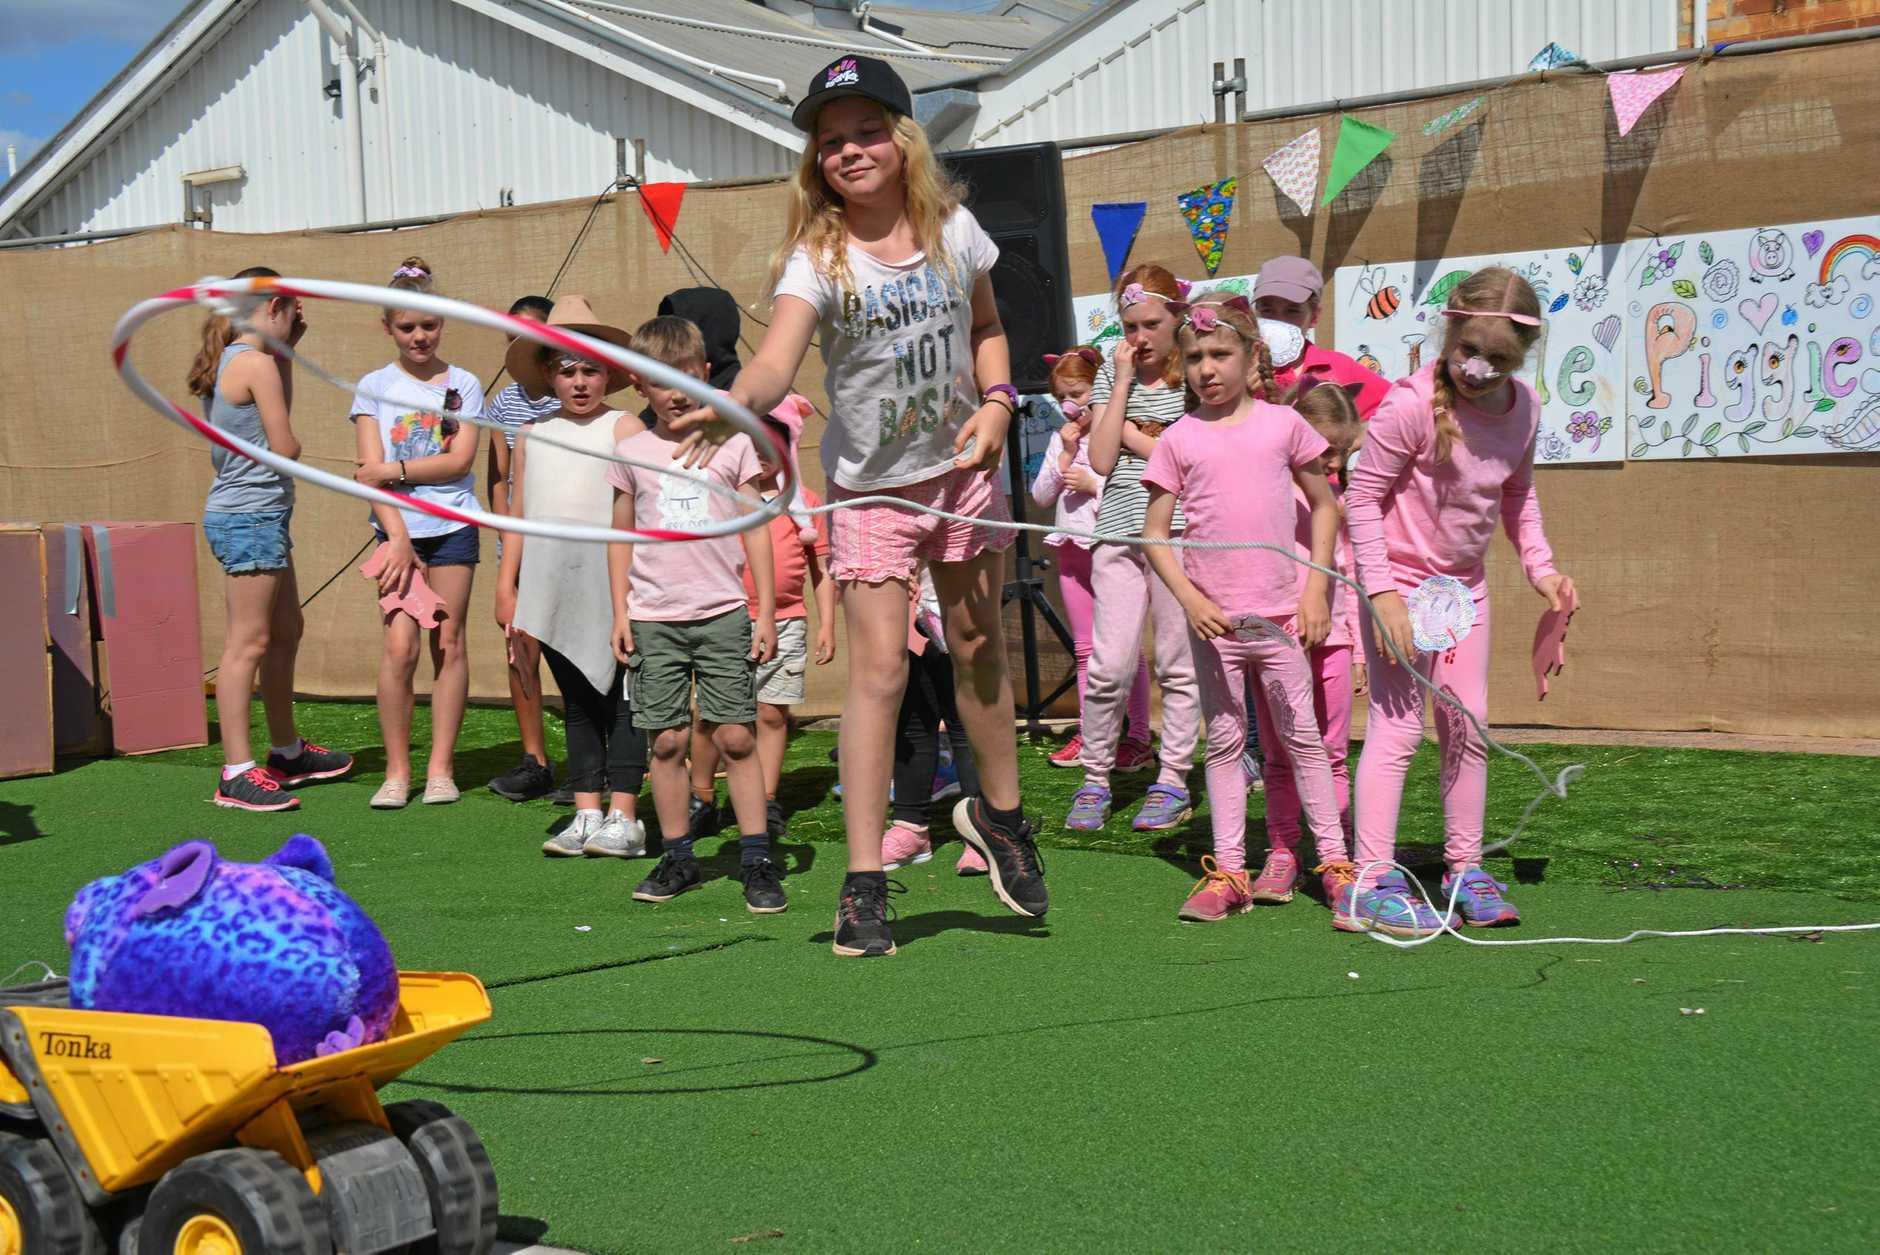 FESTIVAL FUN: Sophie Vogelaar at the BaconFest Olympics.